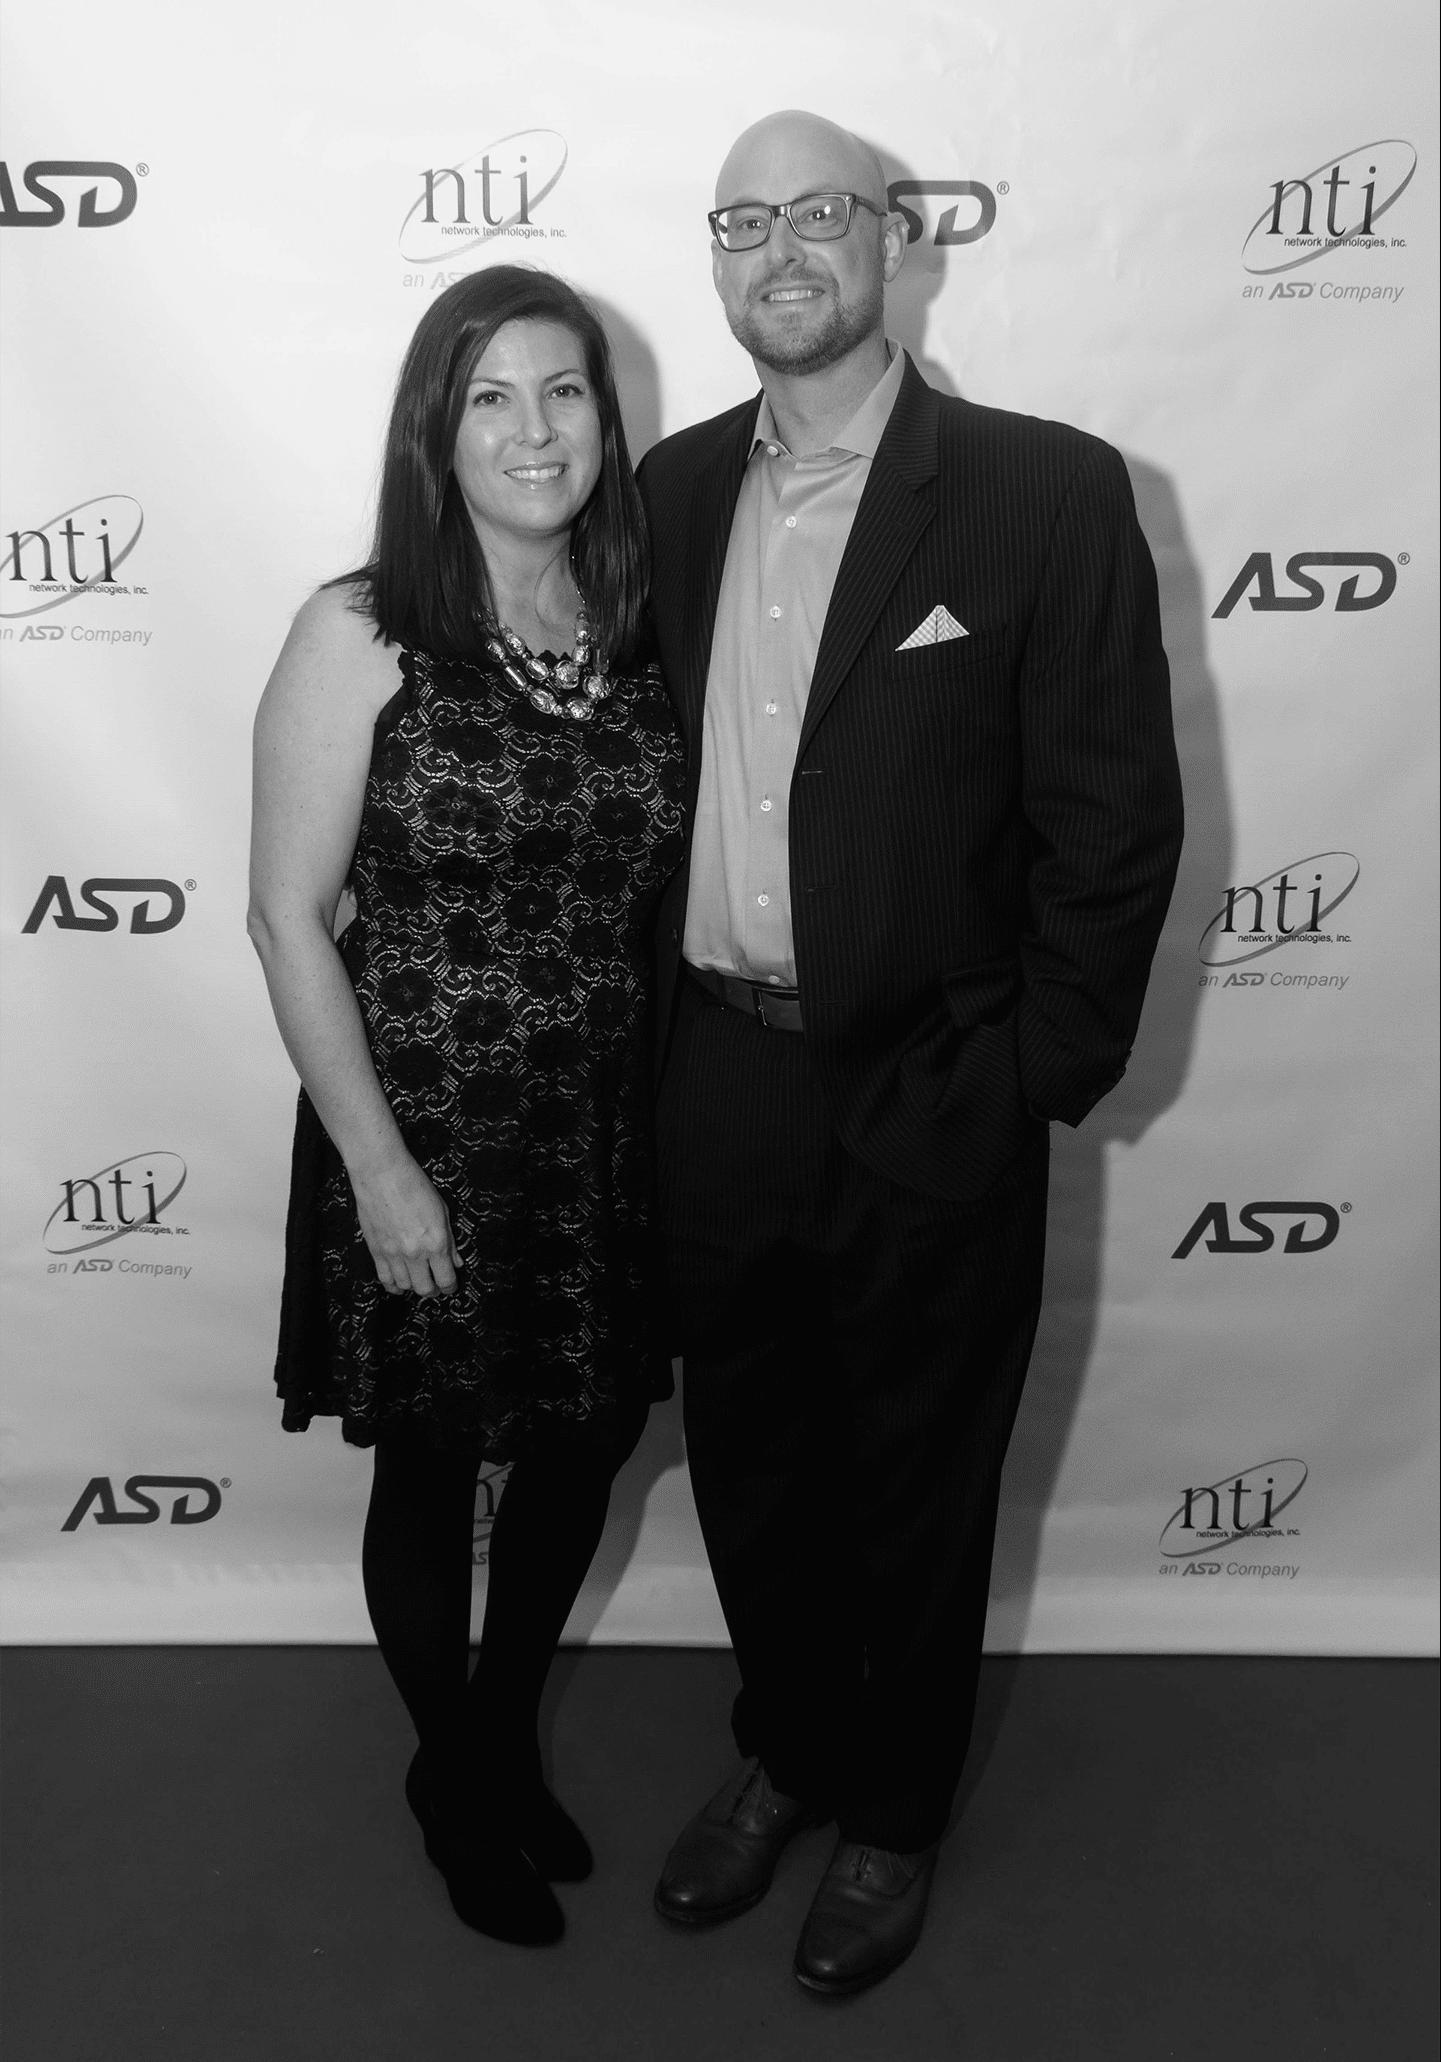 ASD Career Company Culture